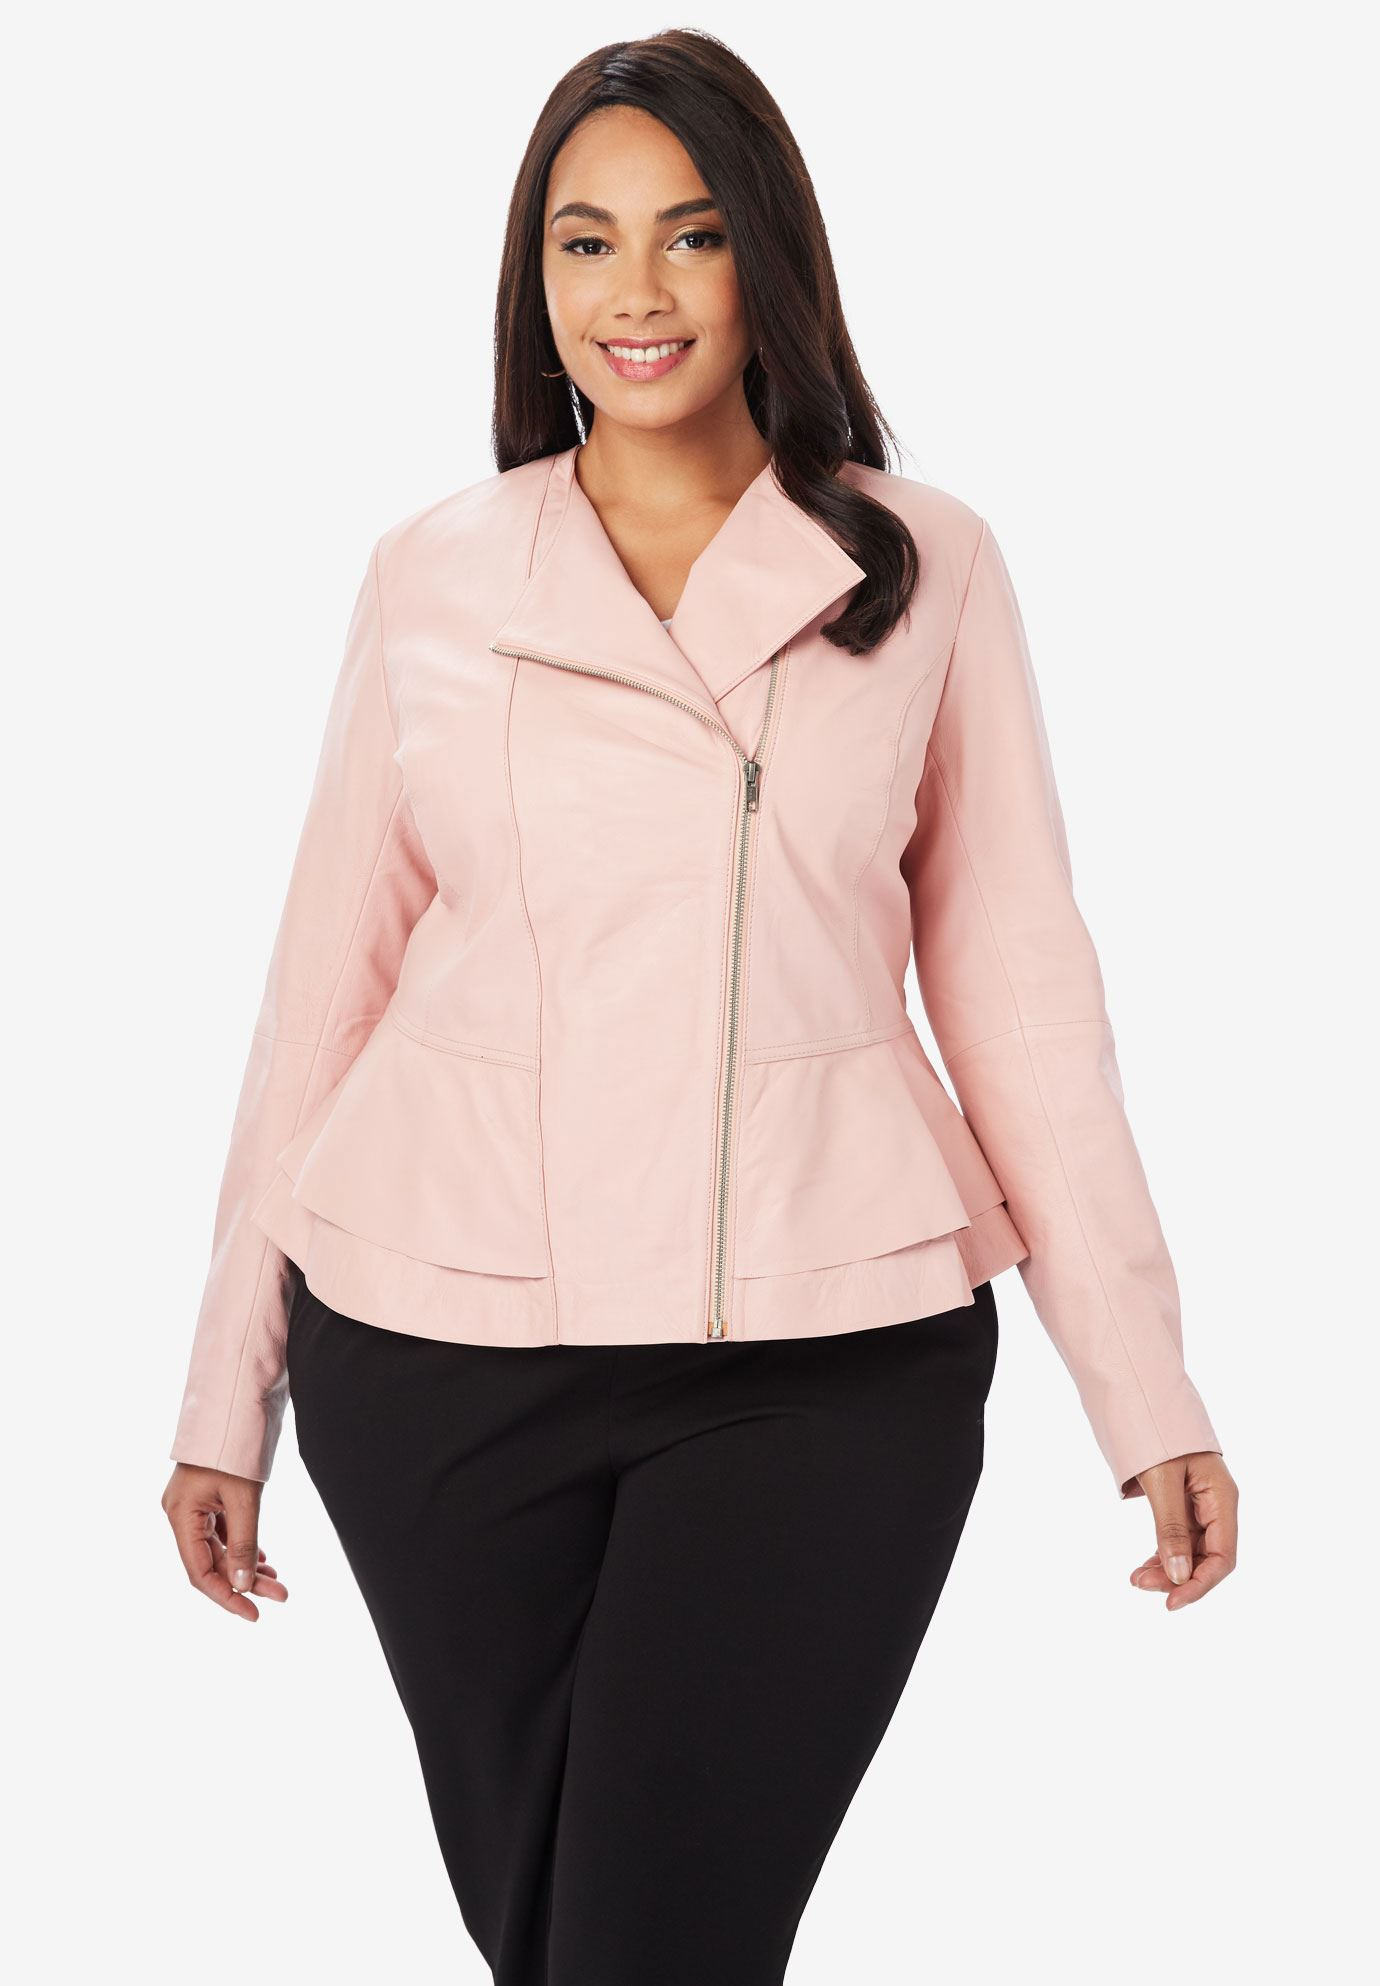 collarless leather peplum jacket plus size jackets